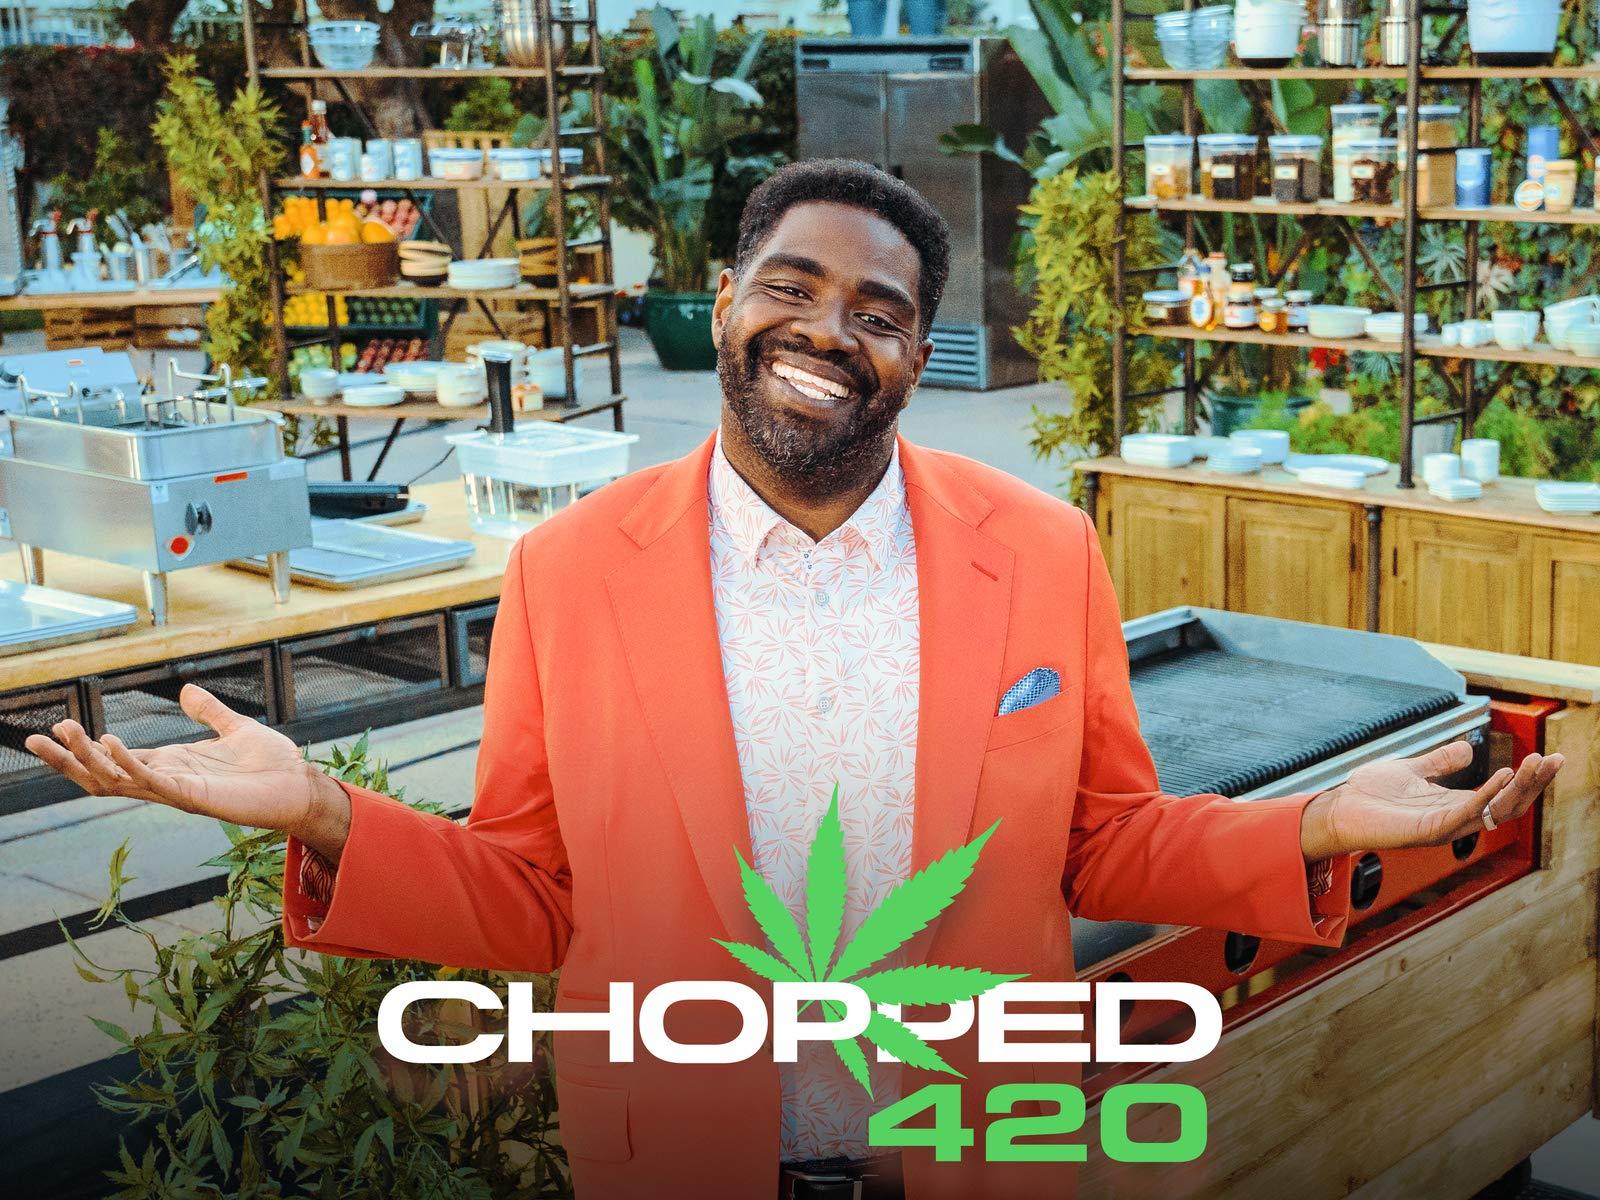 Chopped 420 (2021)